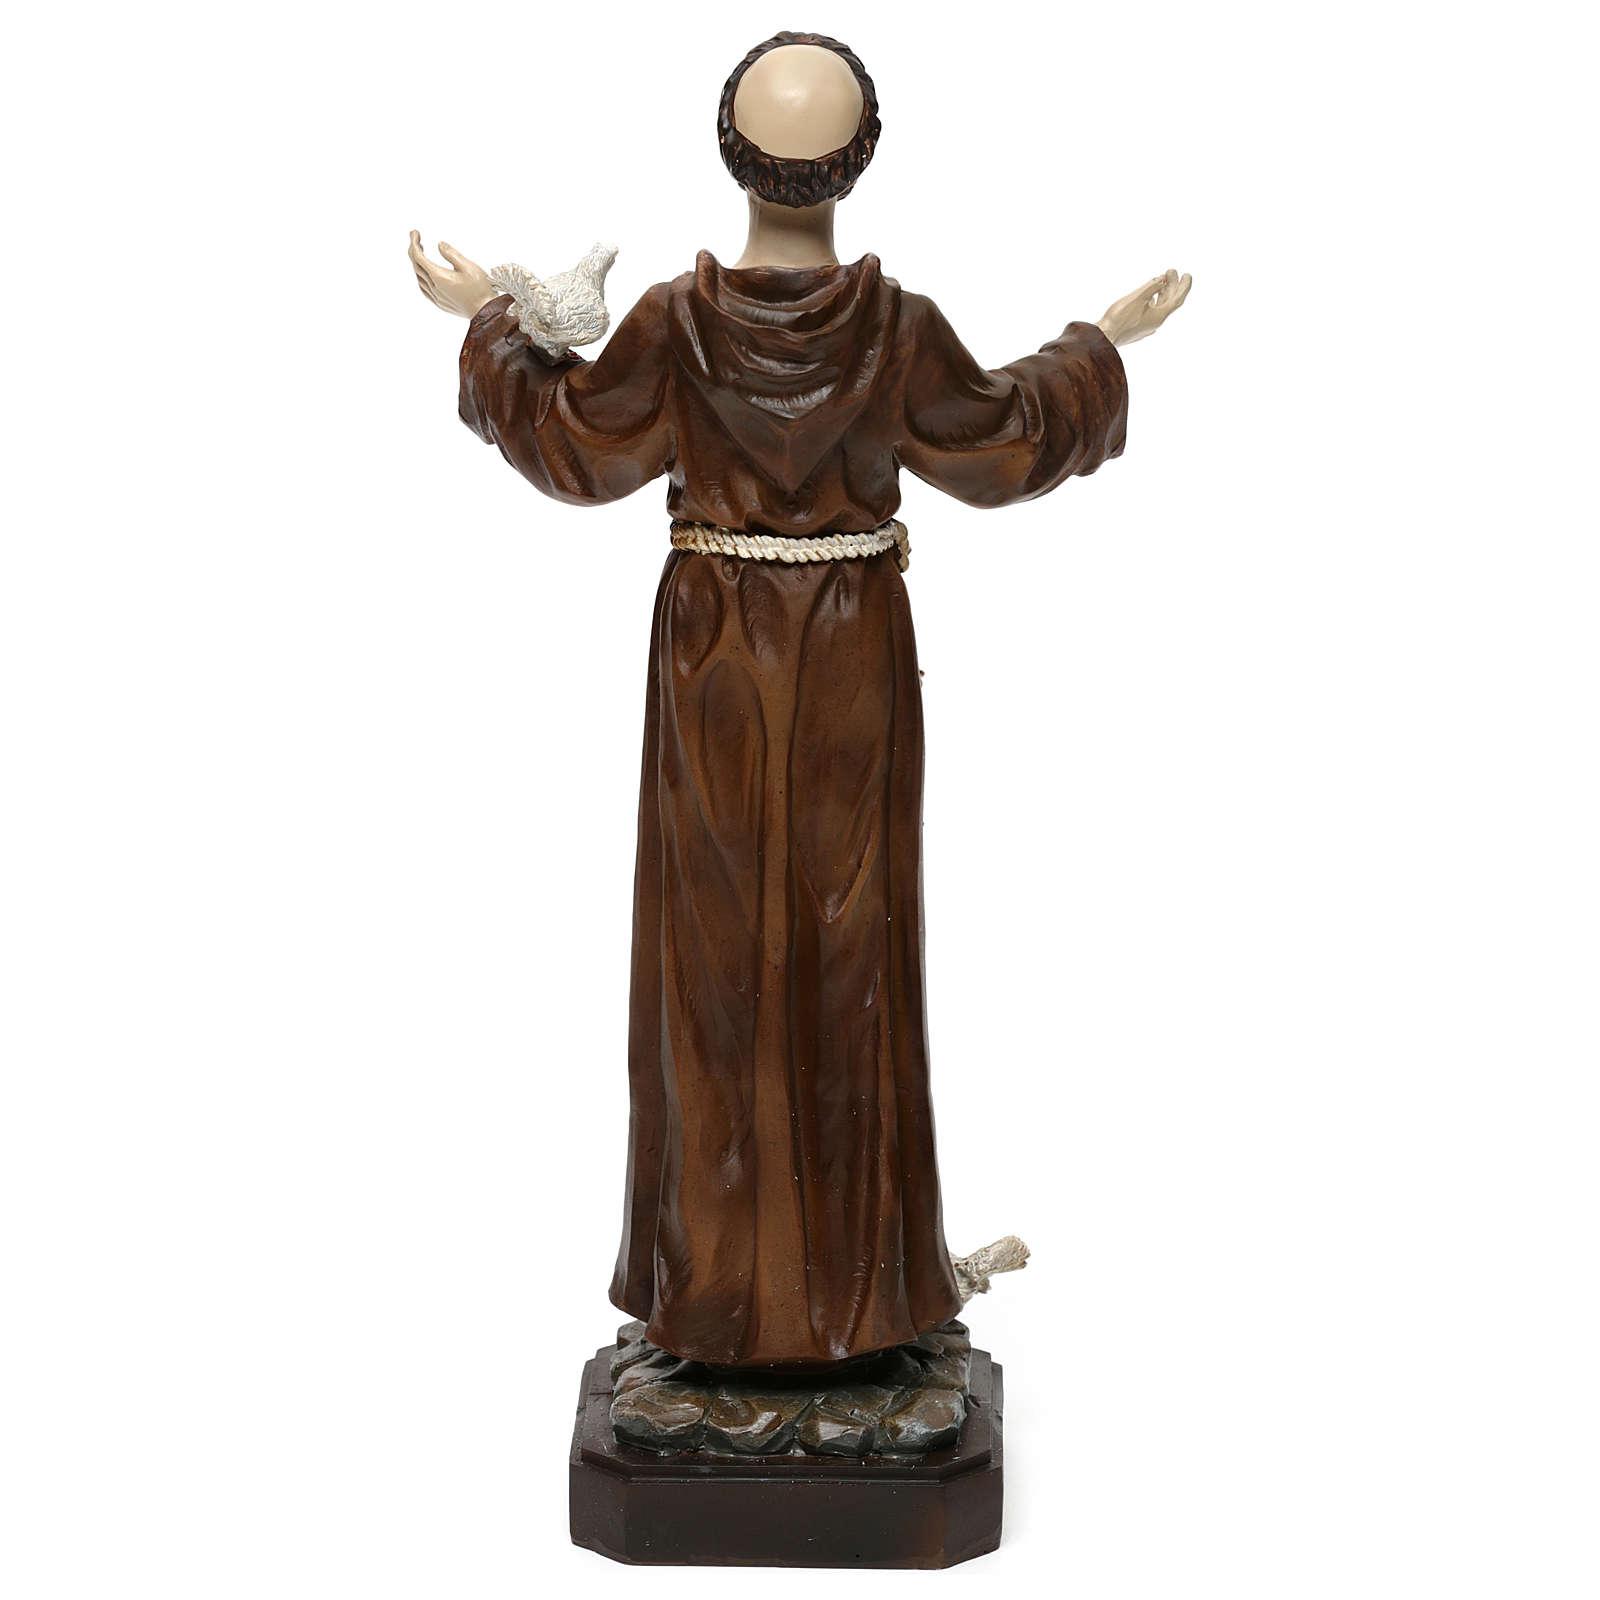 San Francisco h 30 cm estatua de resina 4